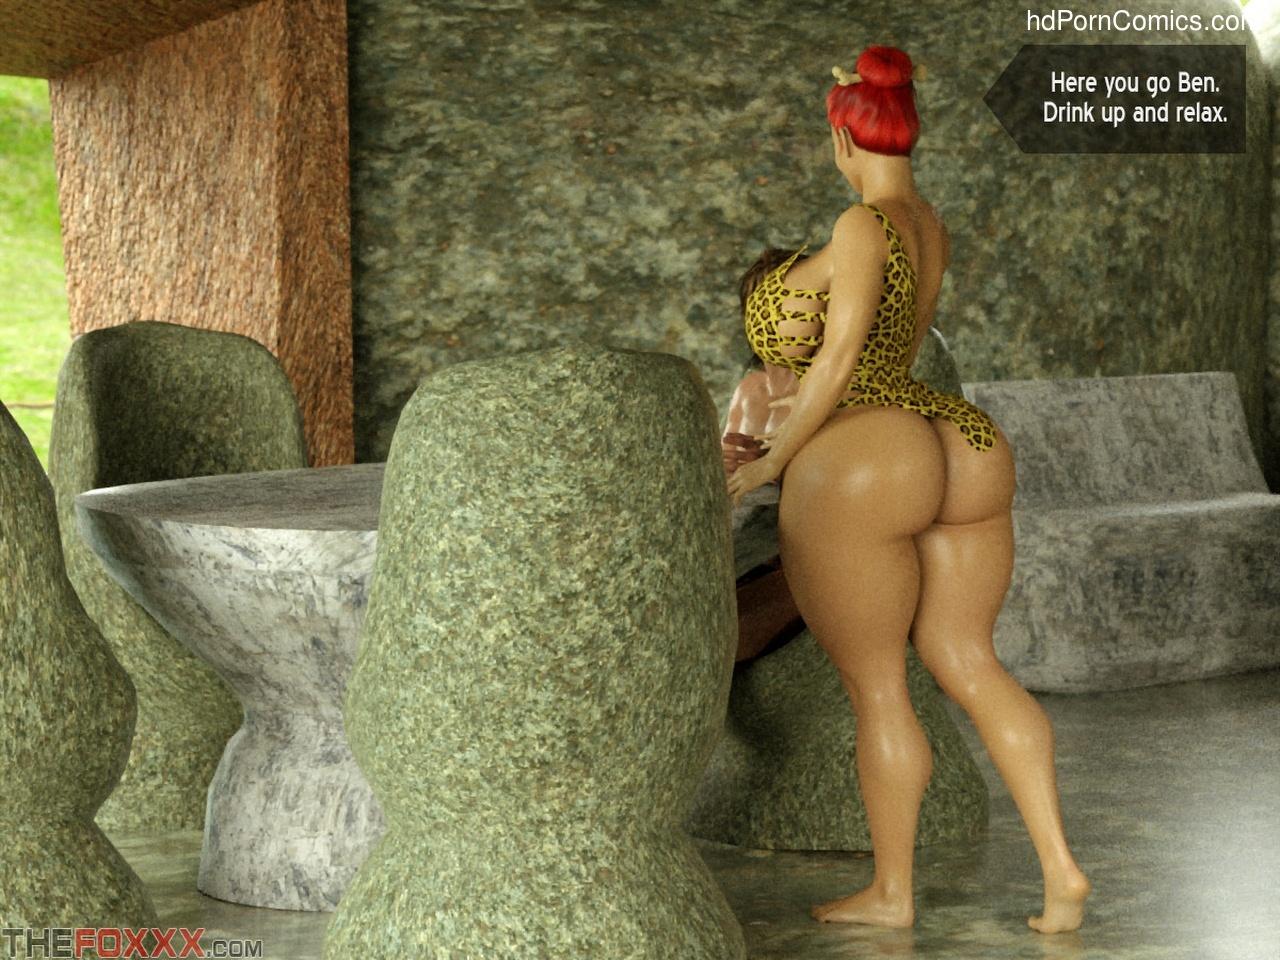 Cavevixens-113 free sex comic